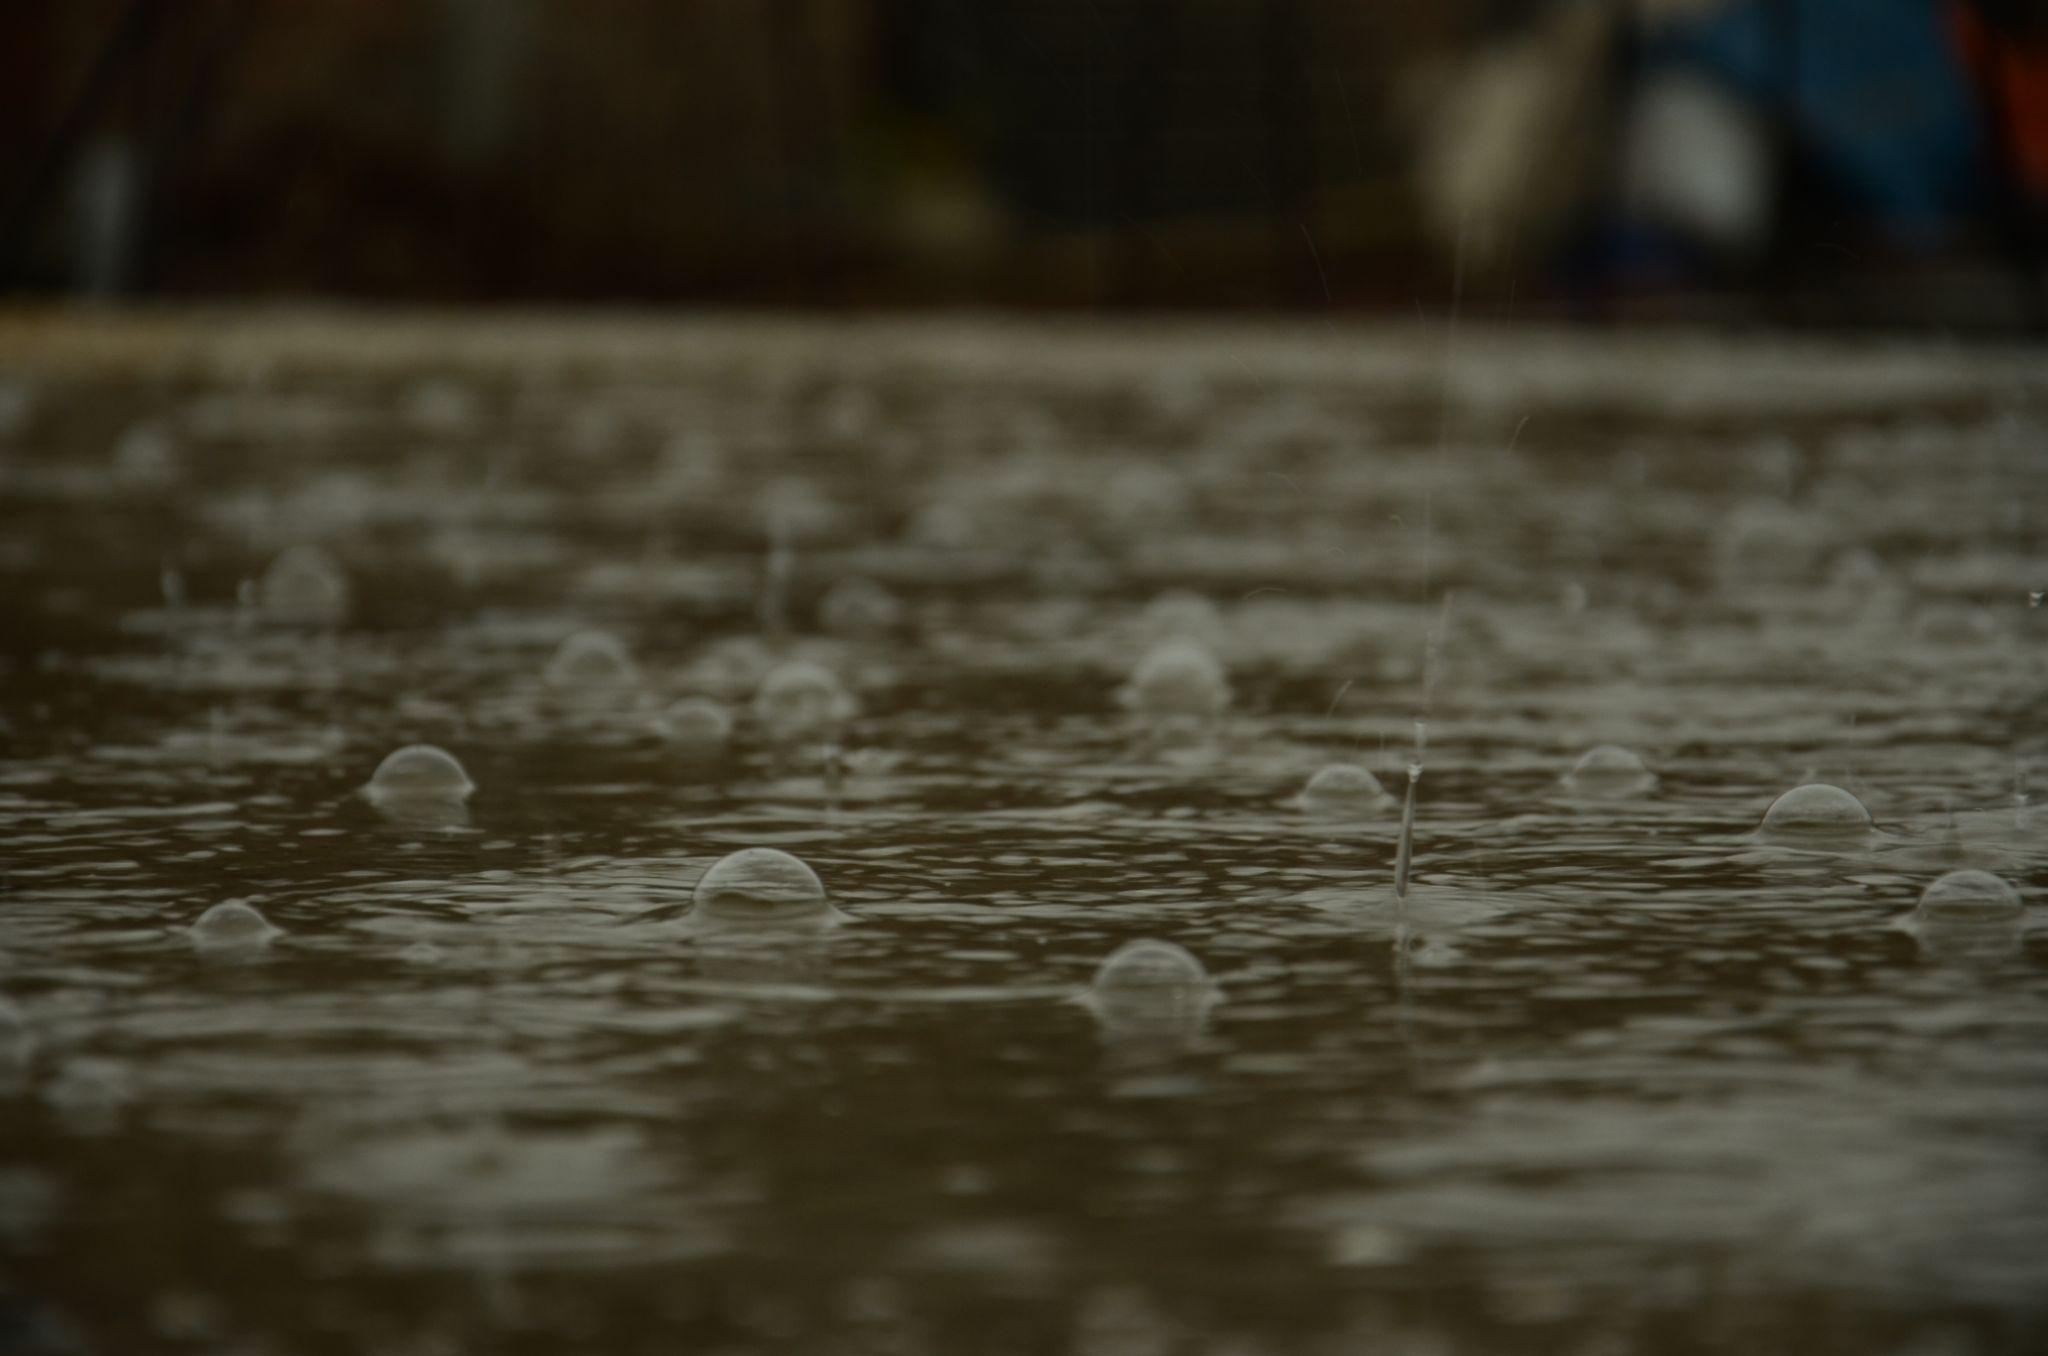 Rain by Ranjeet kumar paswan